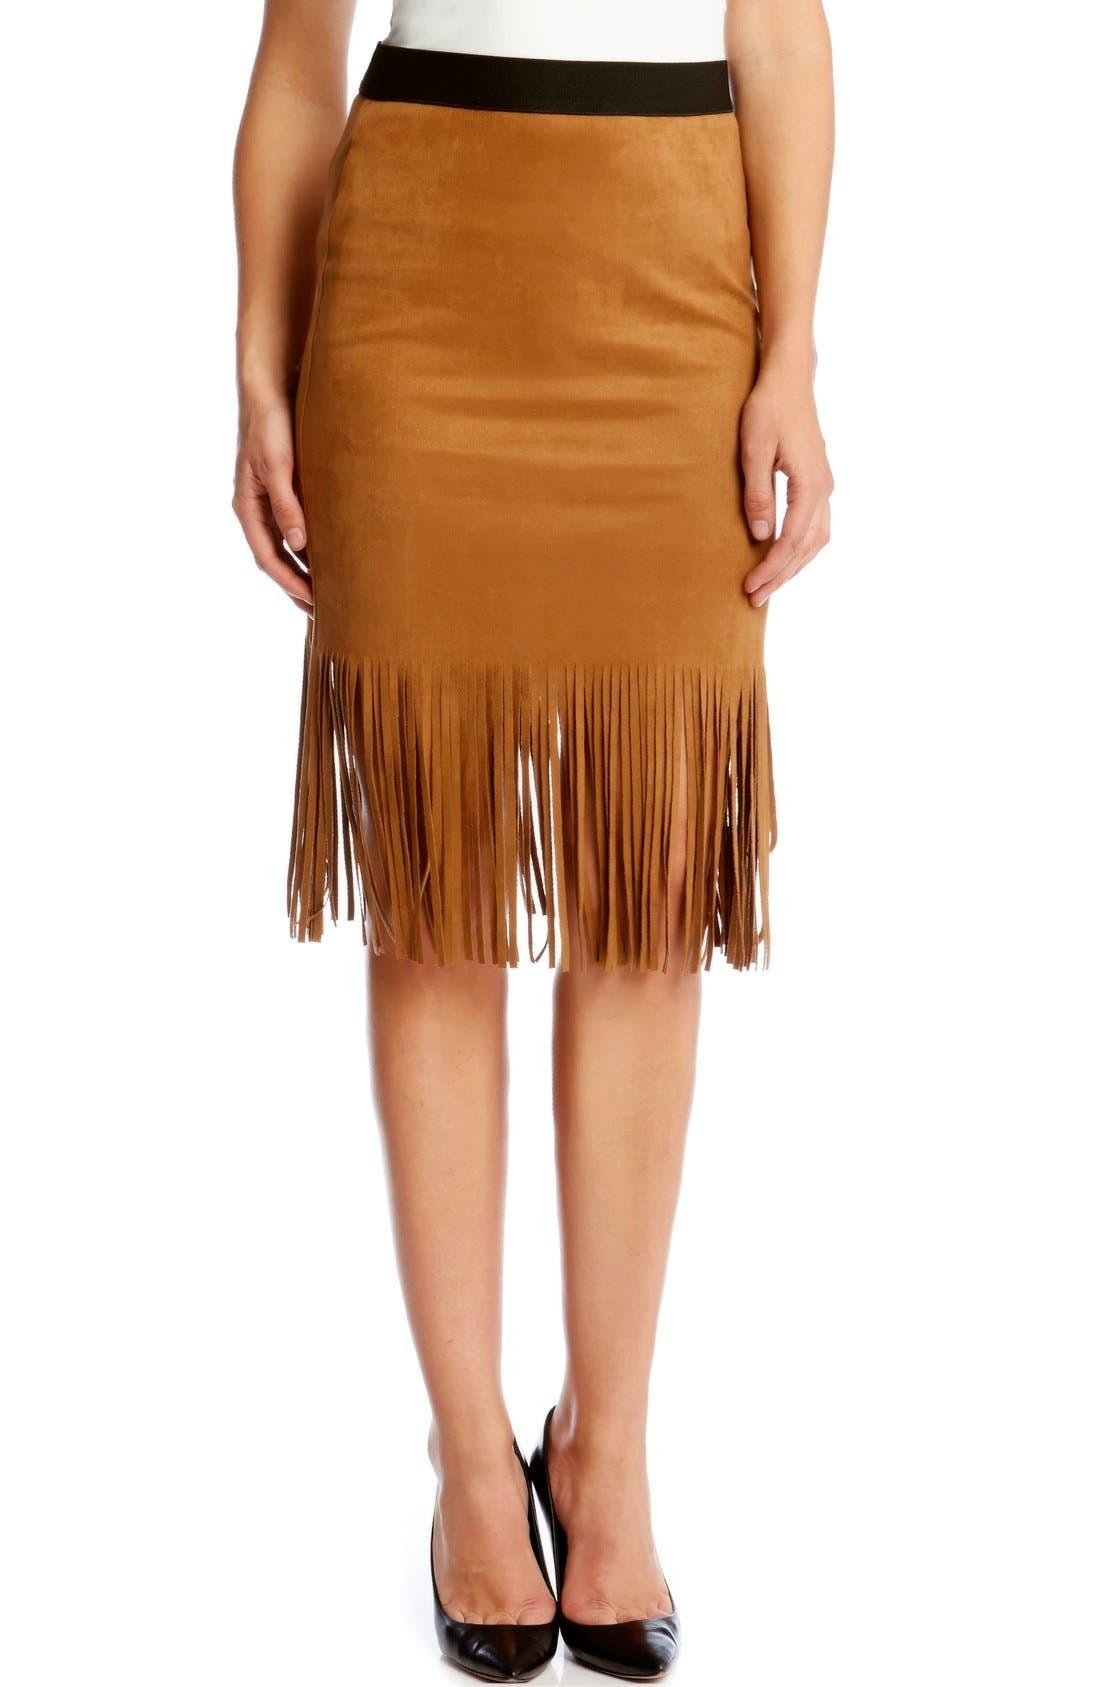 Alternate Image 1 Selected - Karen Kane Faux Suede Midi Pencil Skirt with Fringe